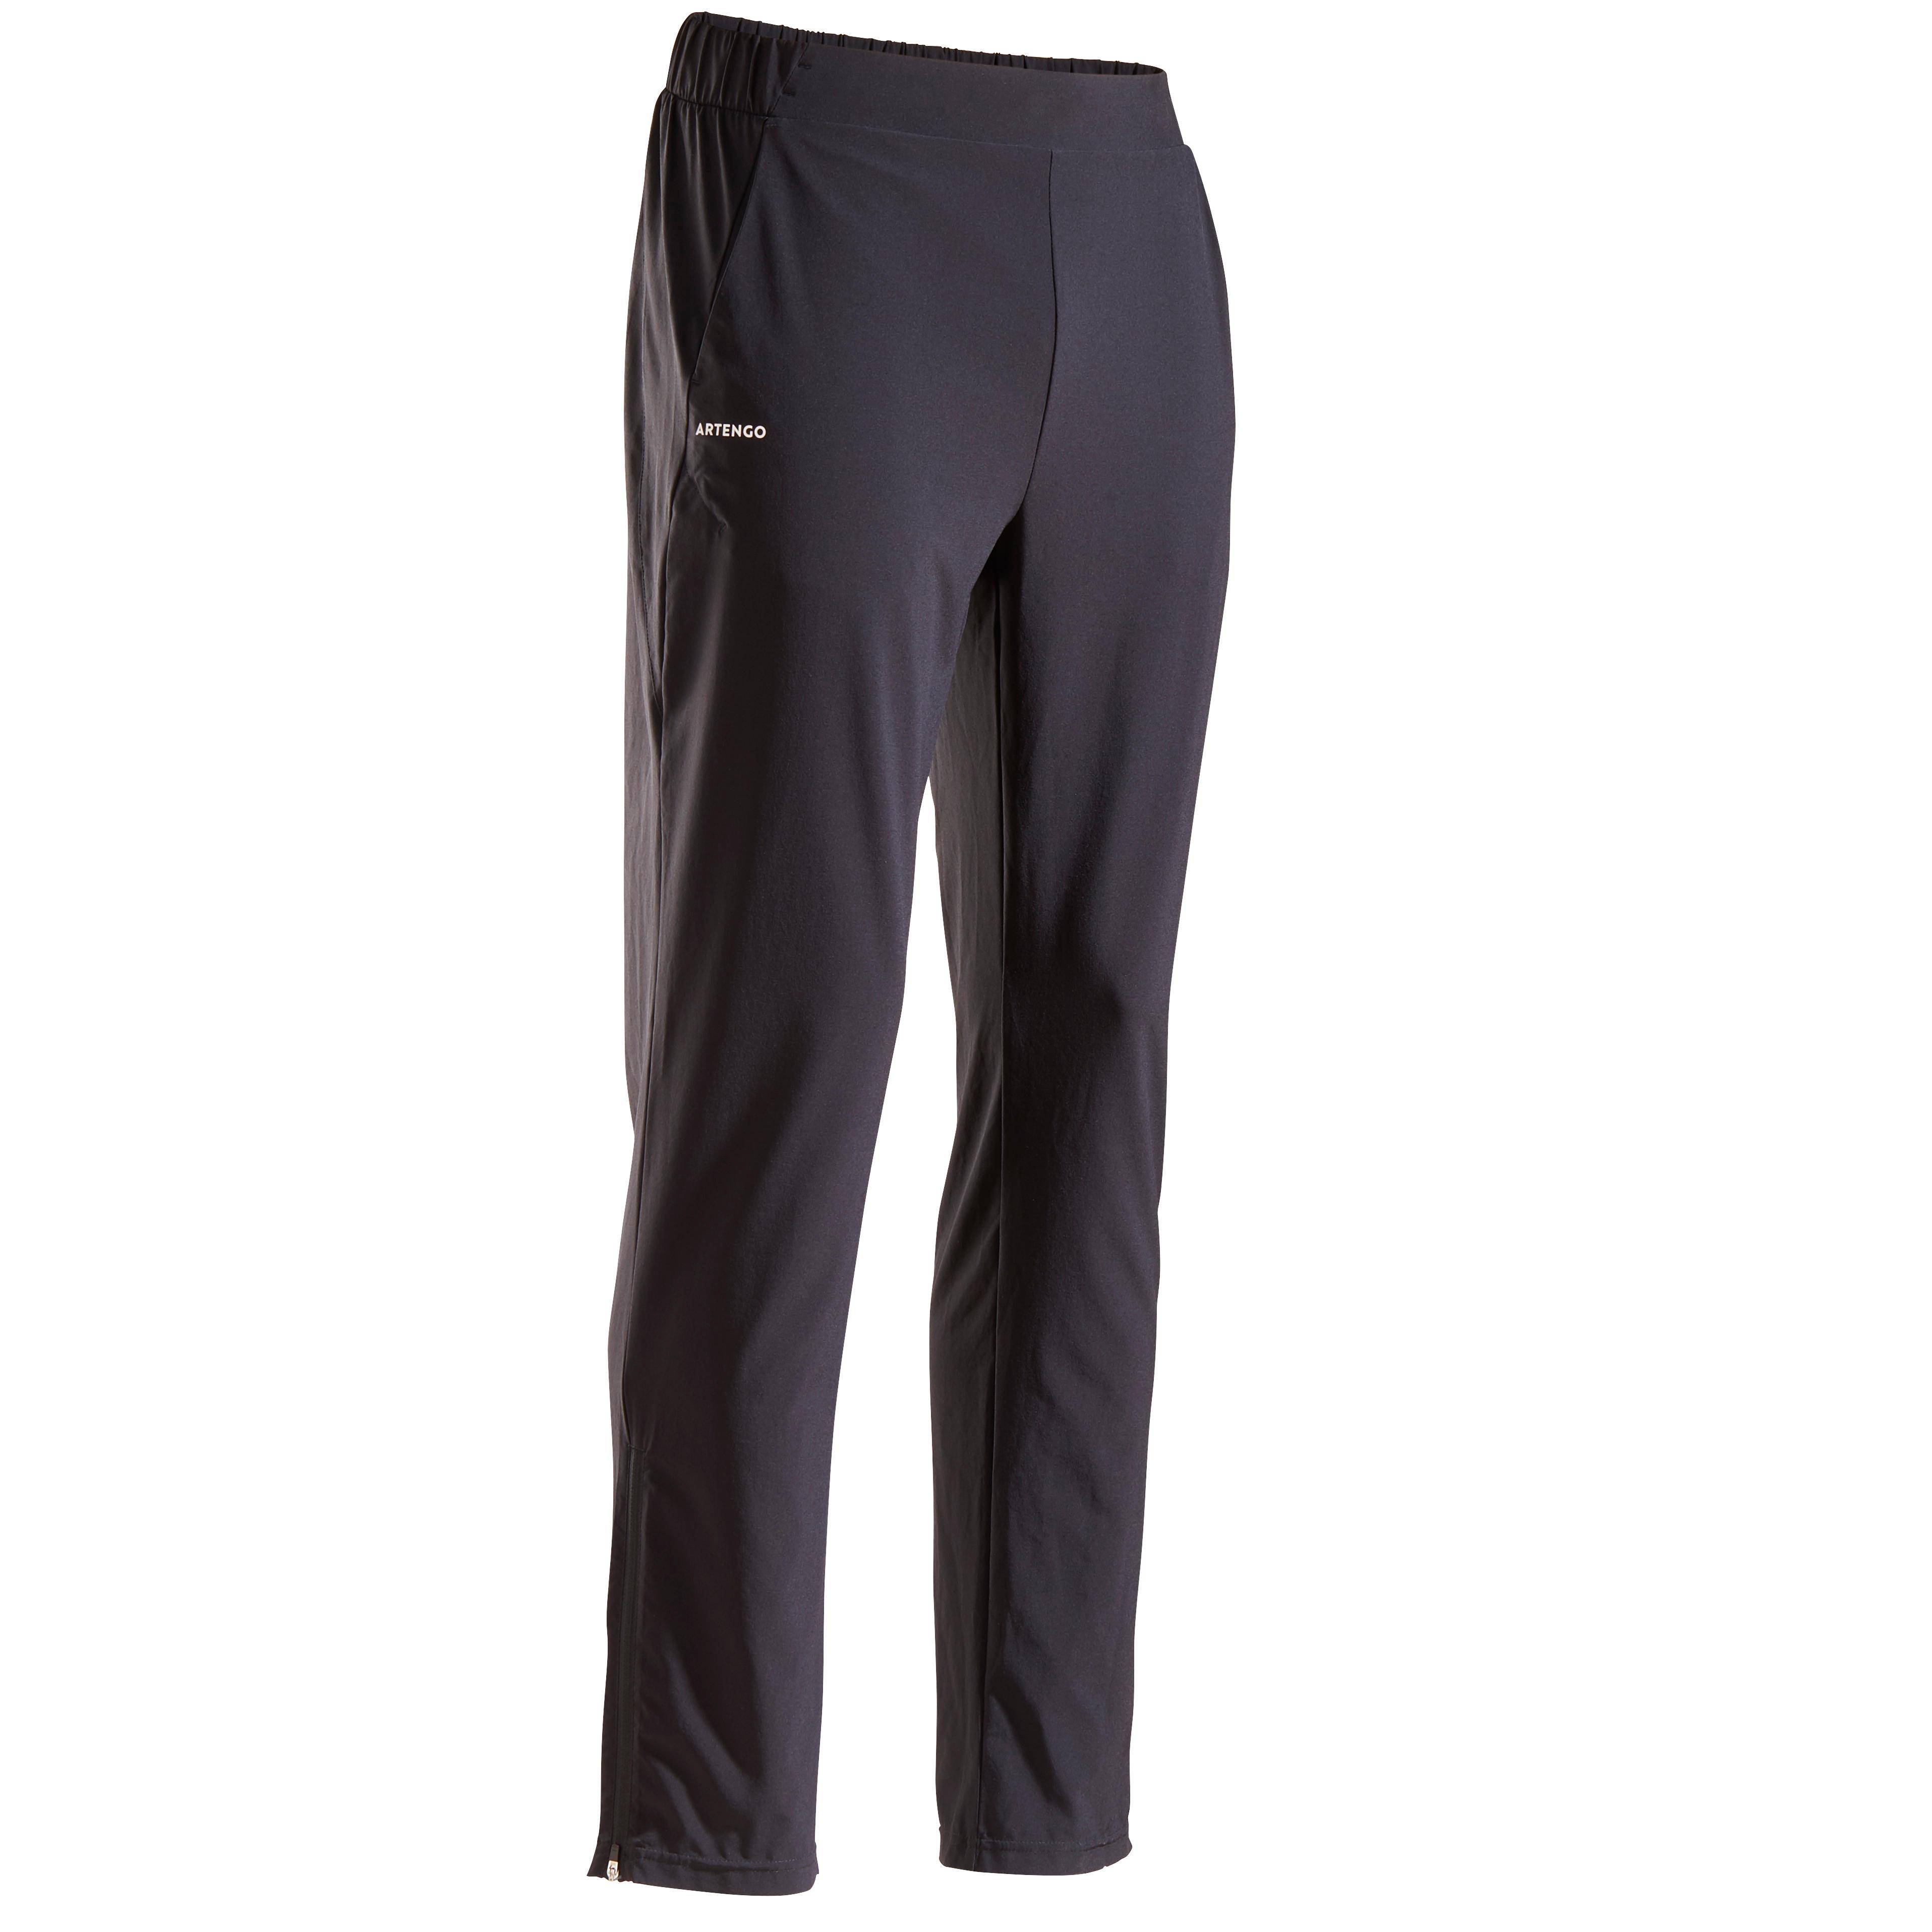 Pantalon Tenis TPA500 Bărbați imagine